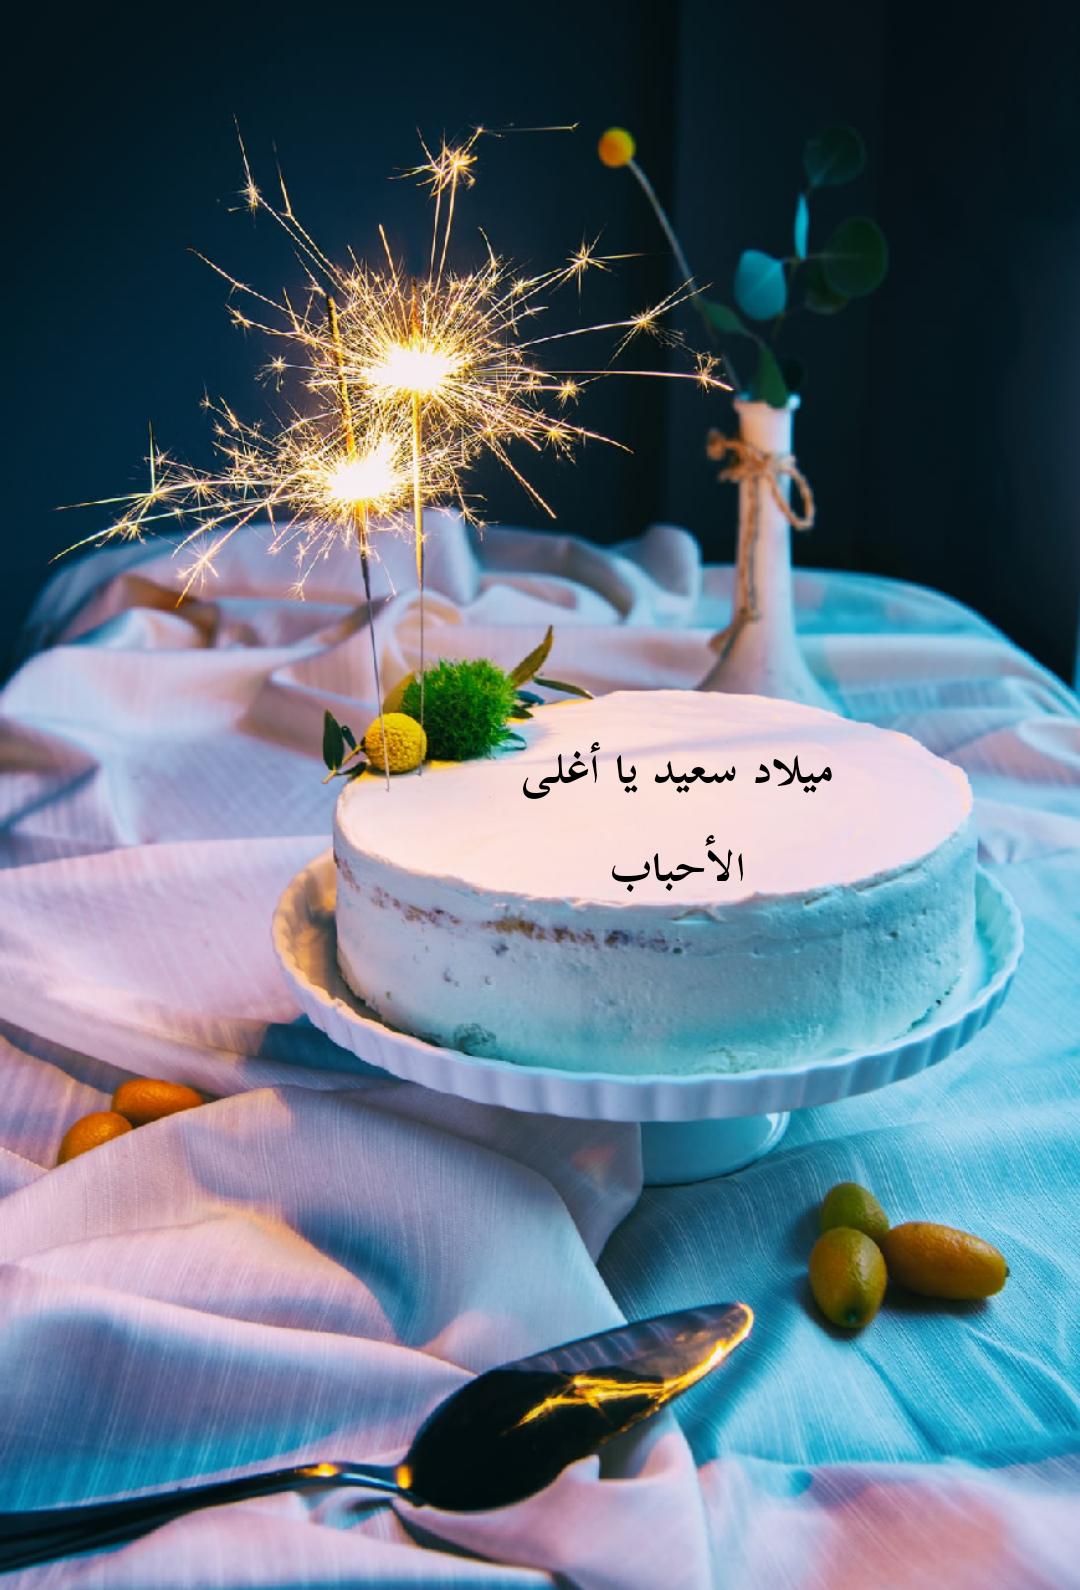 صور عيد ميلاد 2021 1